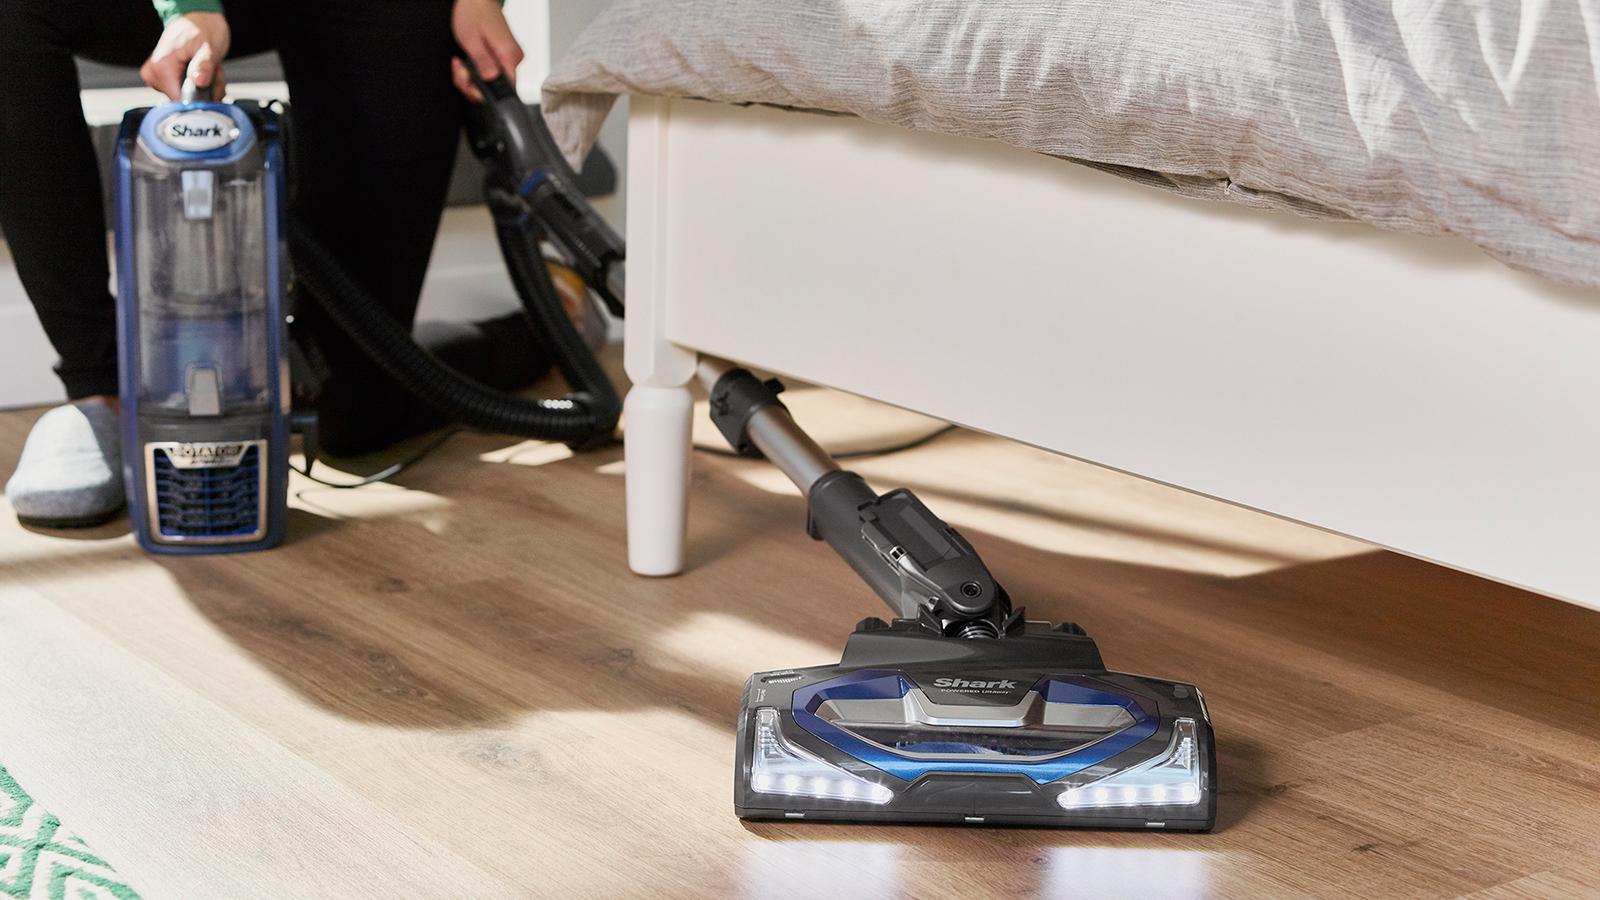 Shark Powered Lift Away Upright Vacuum Cleaner Nv681uk